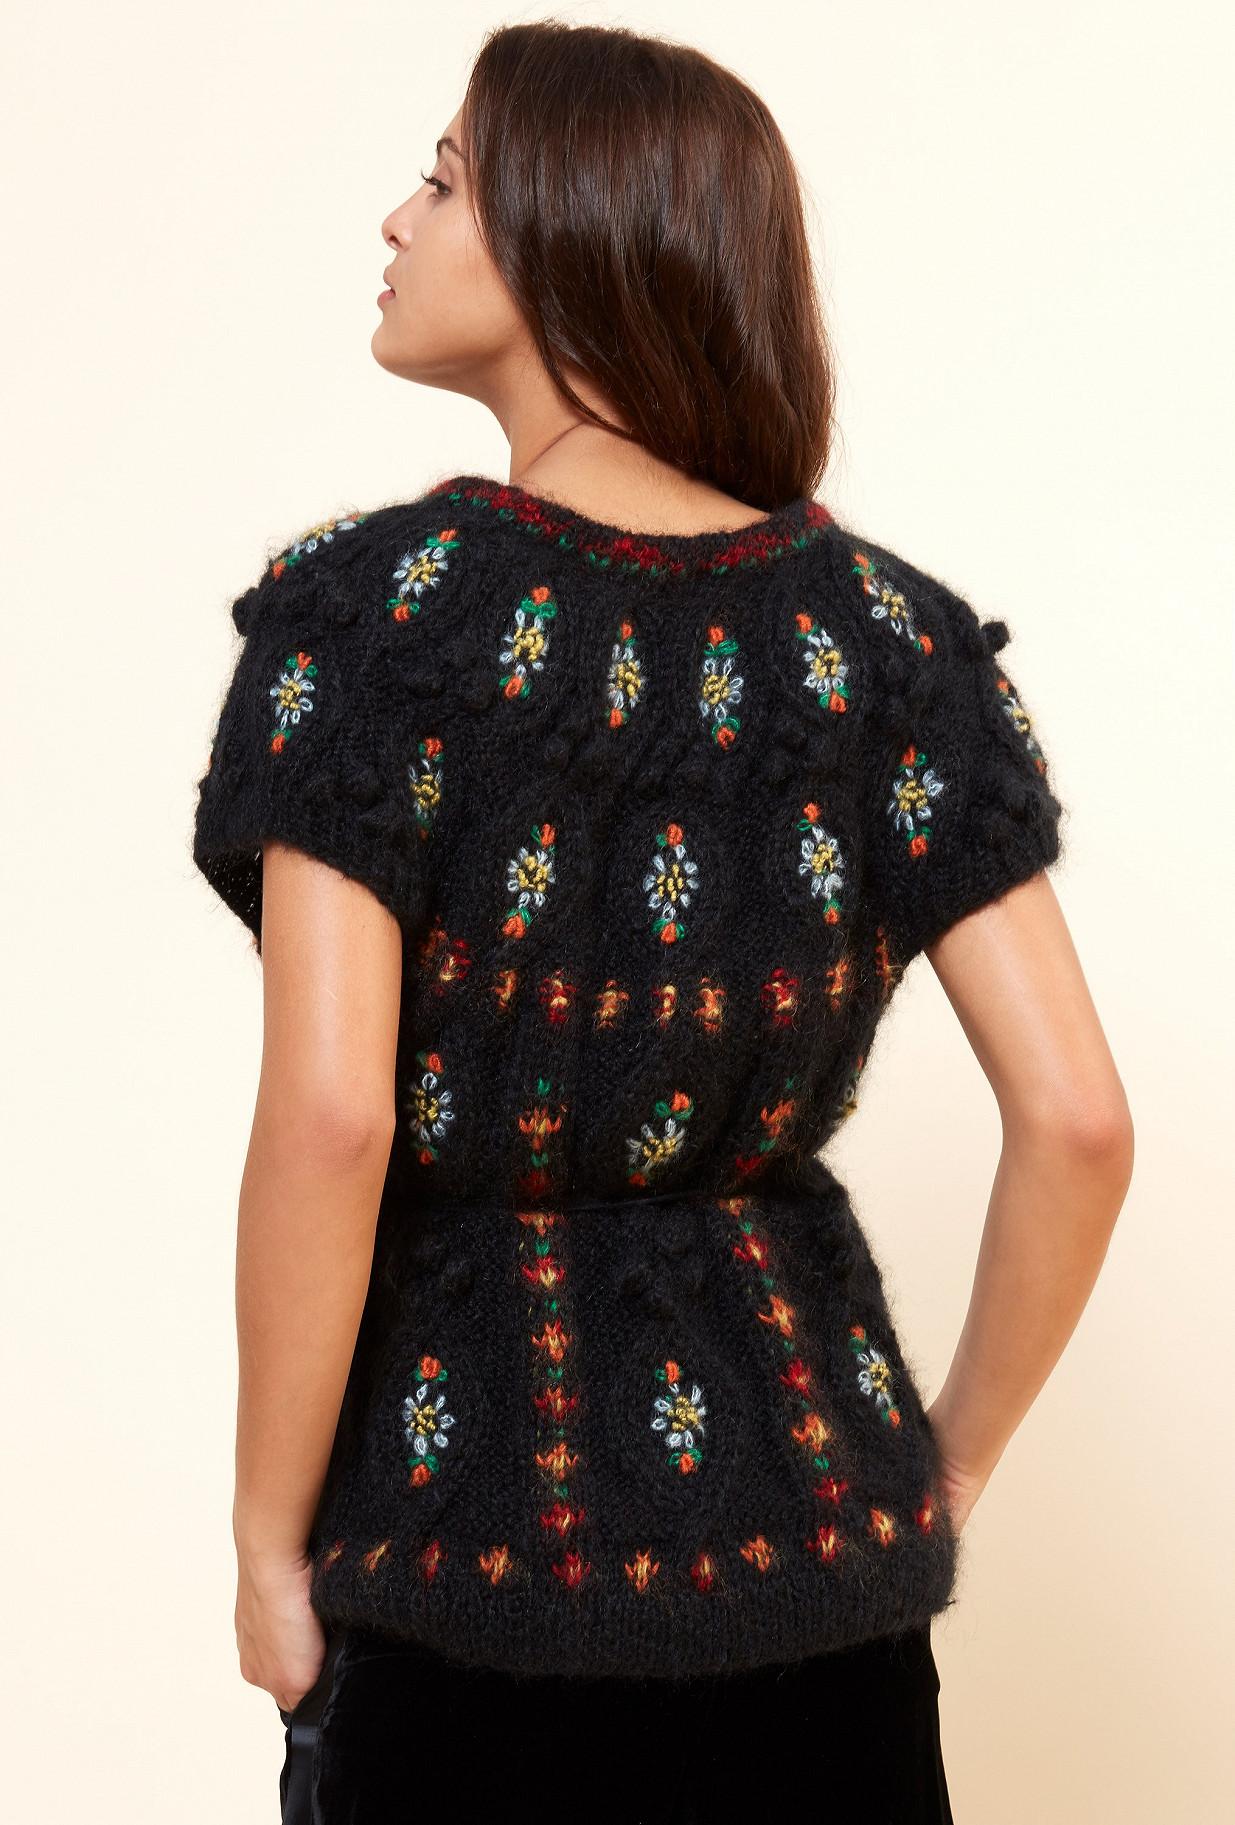 Paris clothes store Knit  Cheers french designer fashion Paris